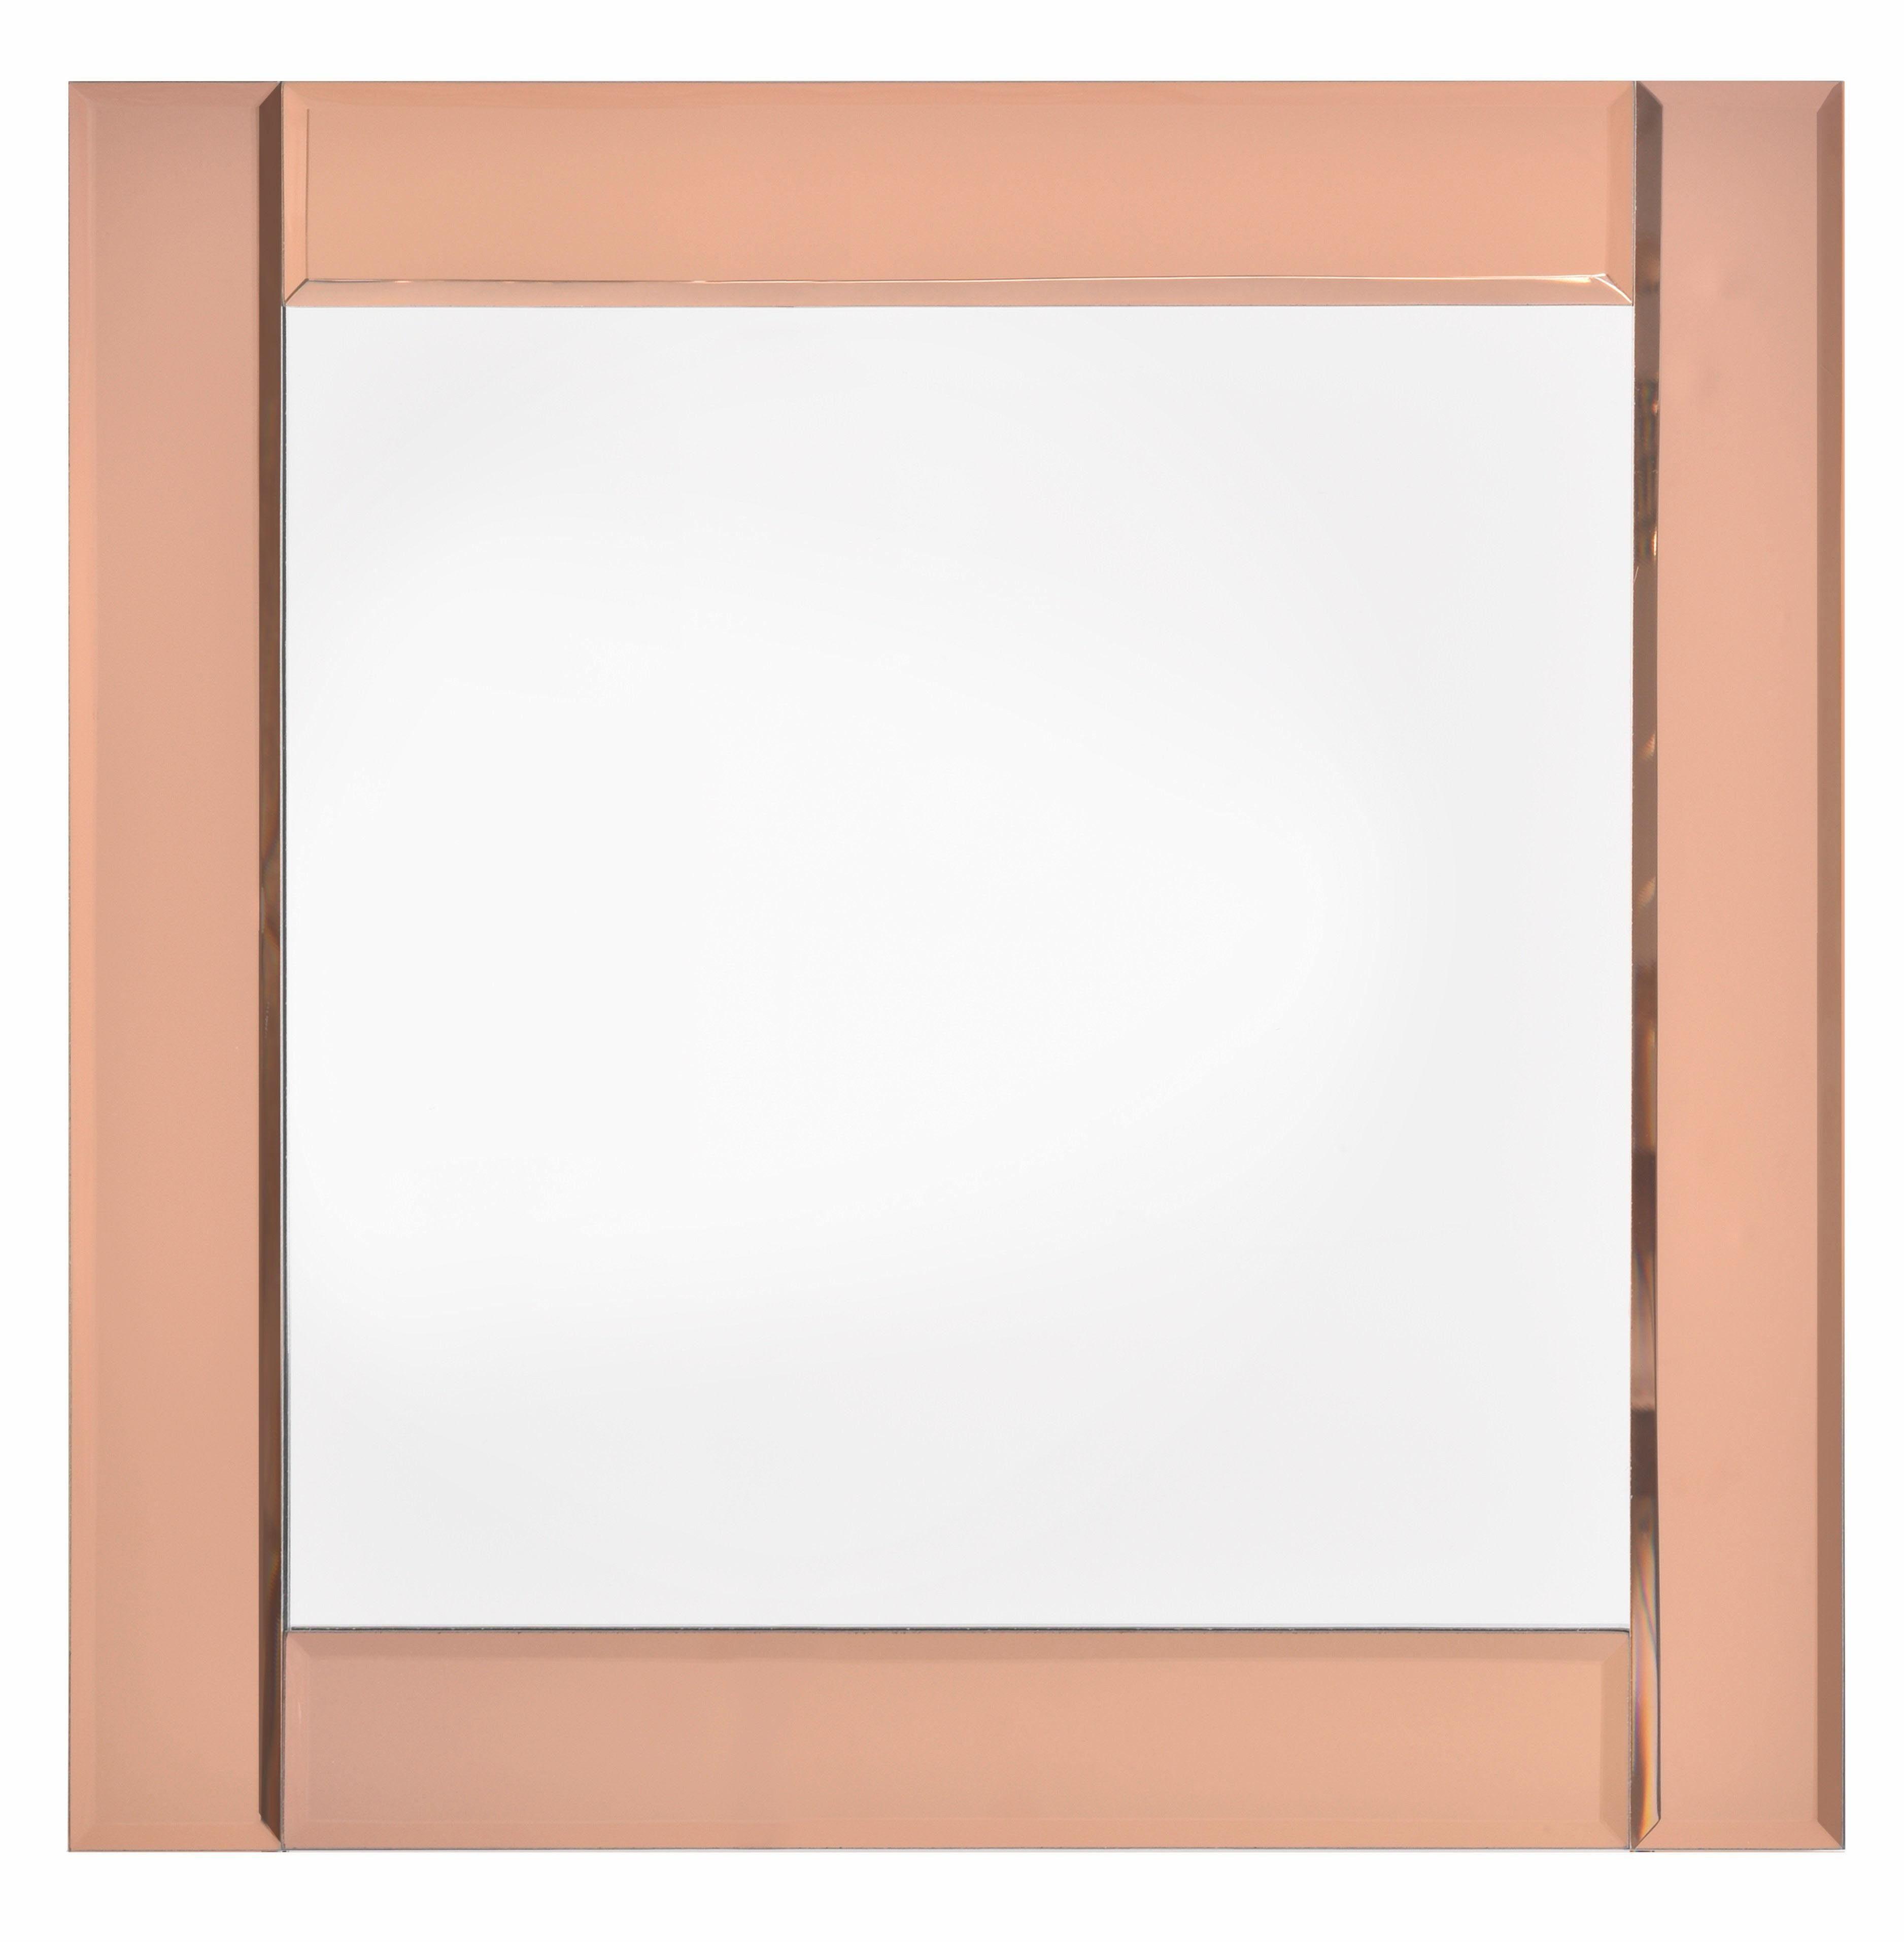 Home affaire Spiegel »Rose Gold Panelled Glass Mirror« 50/50 cm